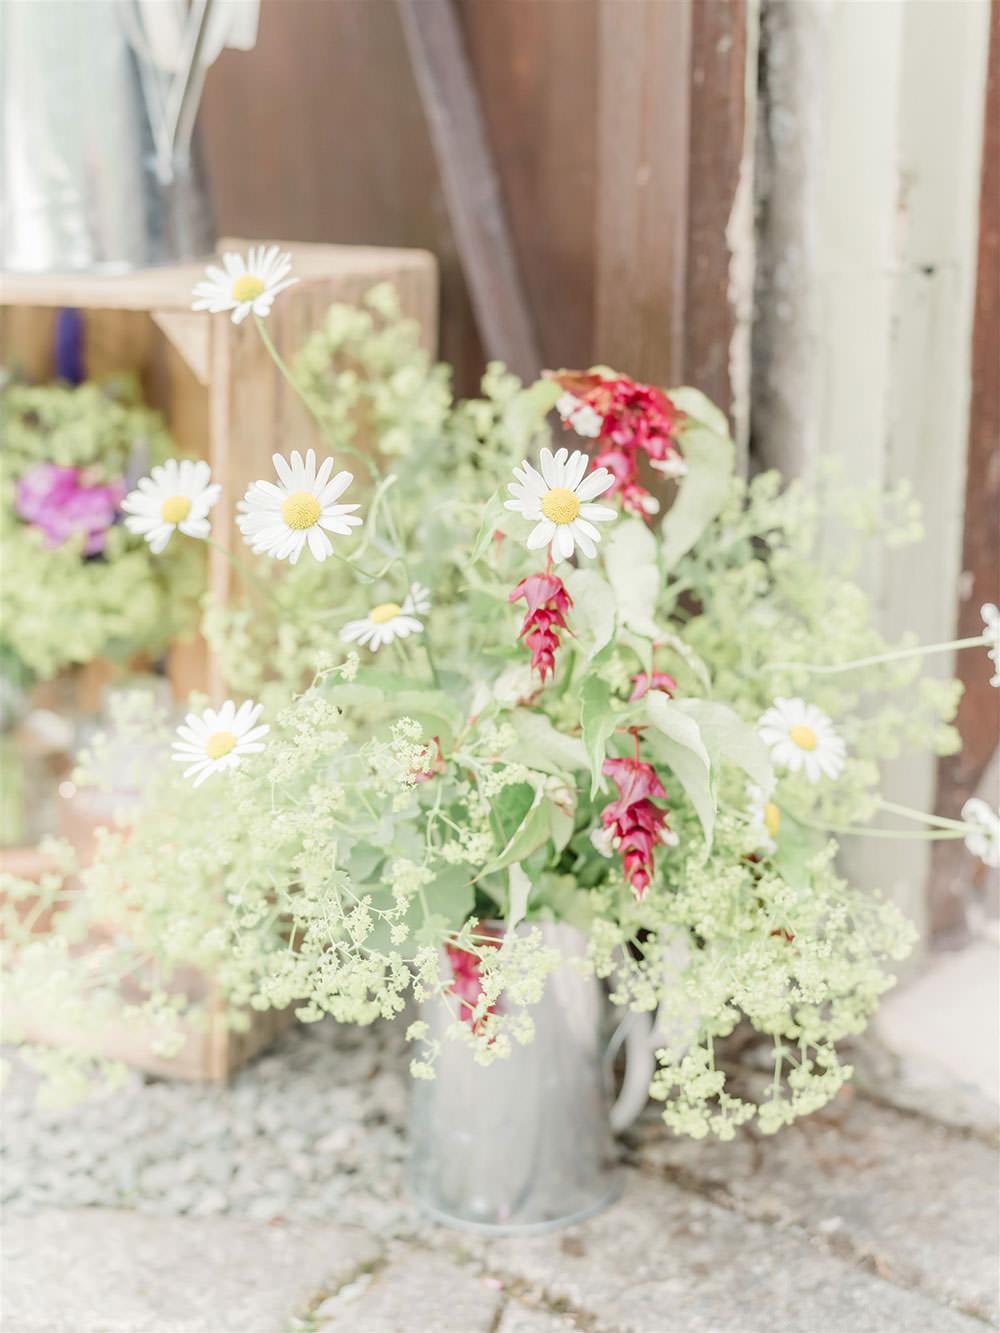 Greenery Flower Wildflower Jug Arrangement Flowers Surprise Wedding Carn Patrick Photography